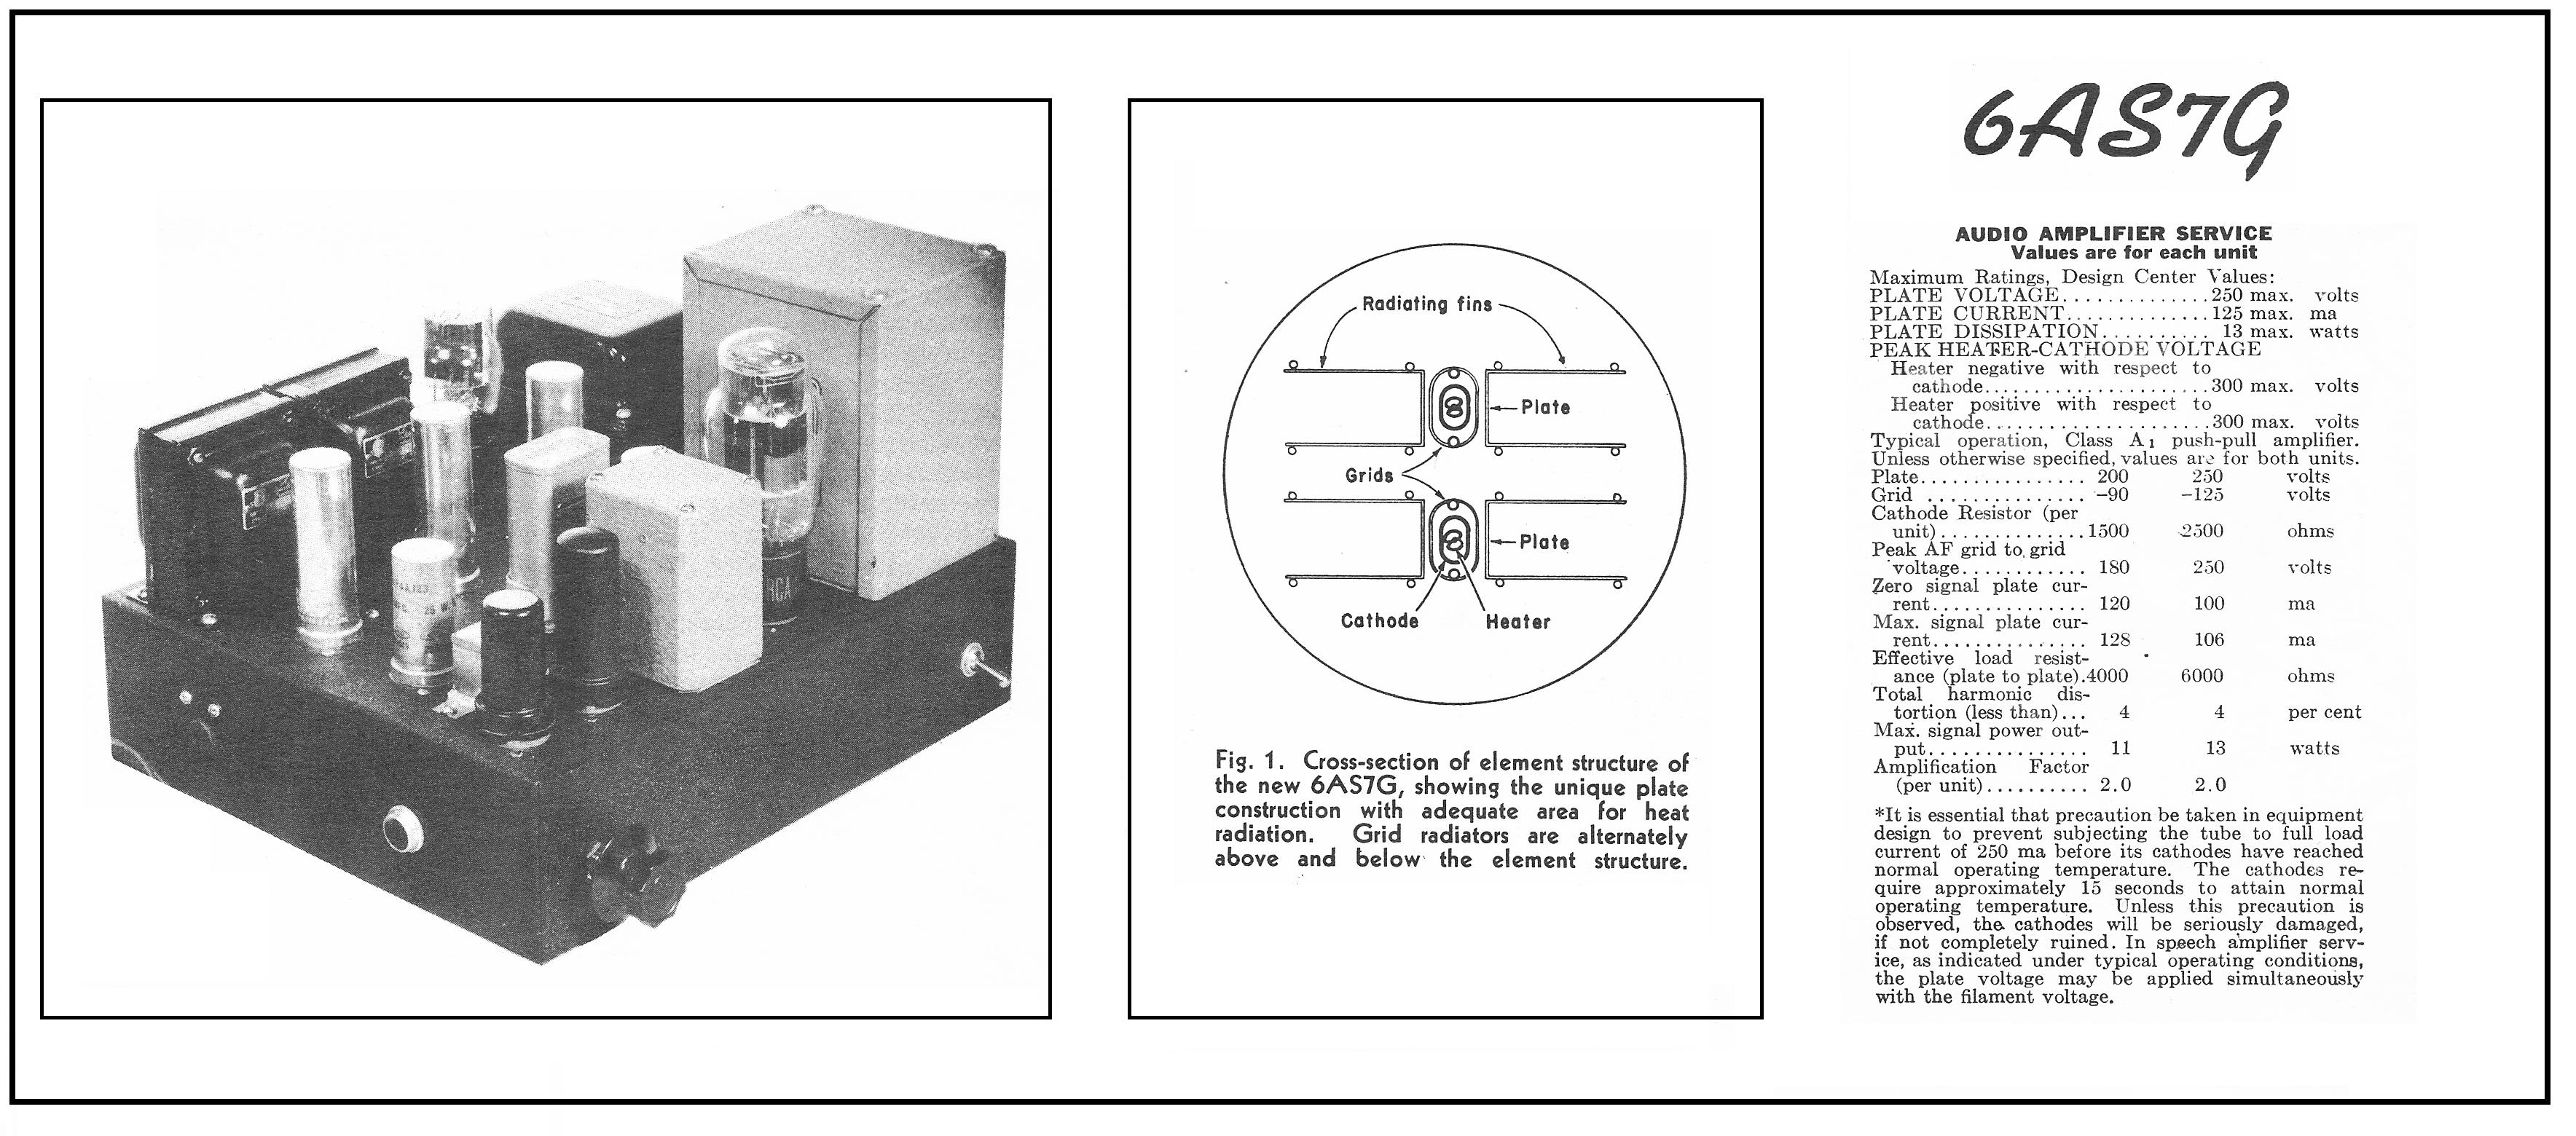 6AS7G, Mcproud, 1948, ill, ed